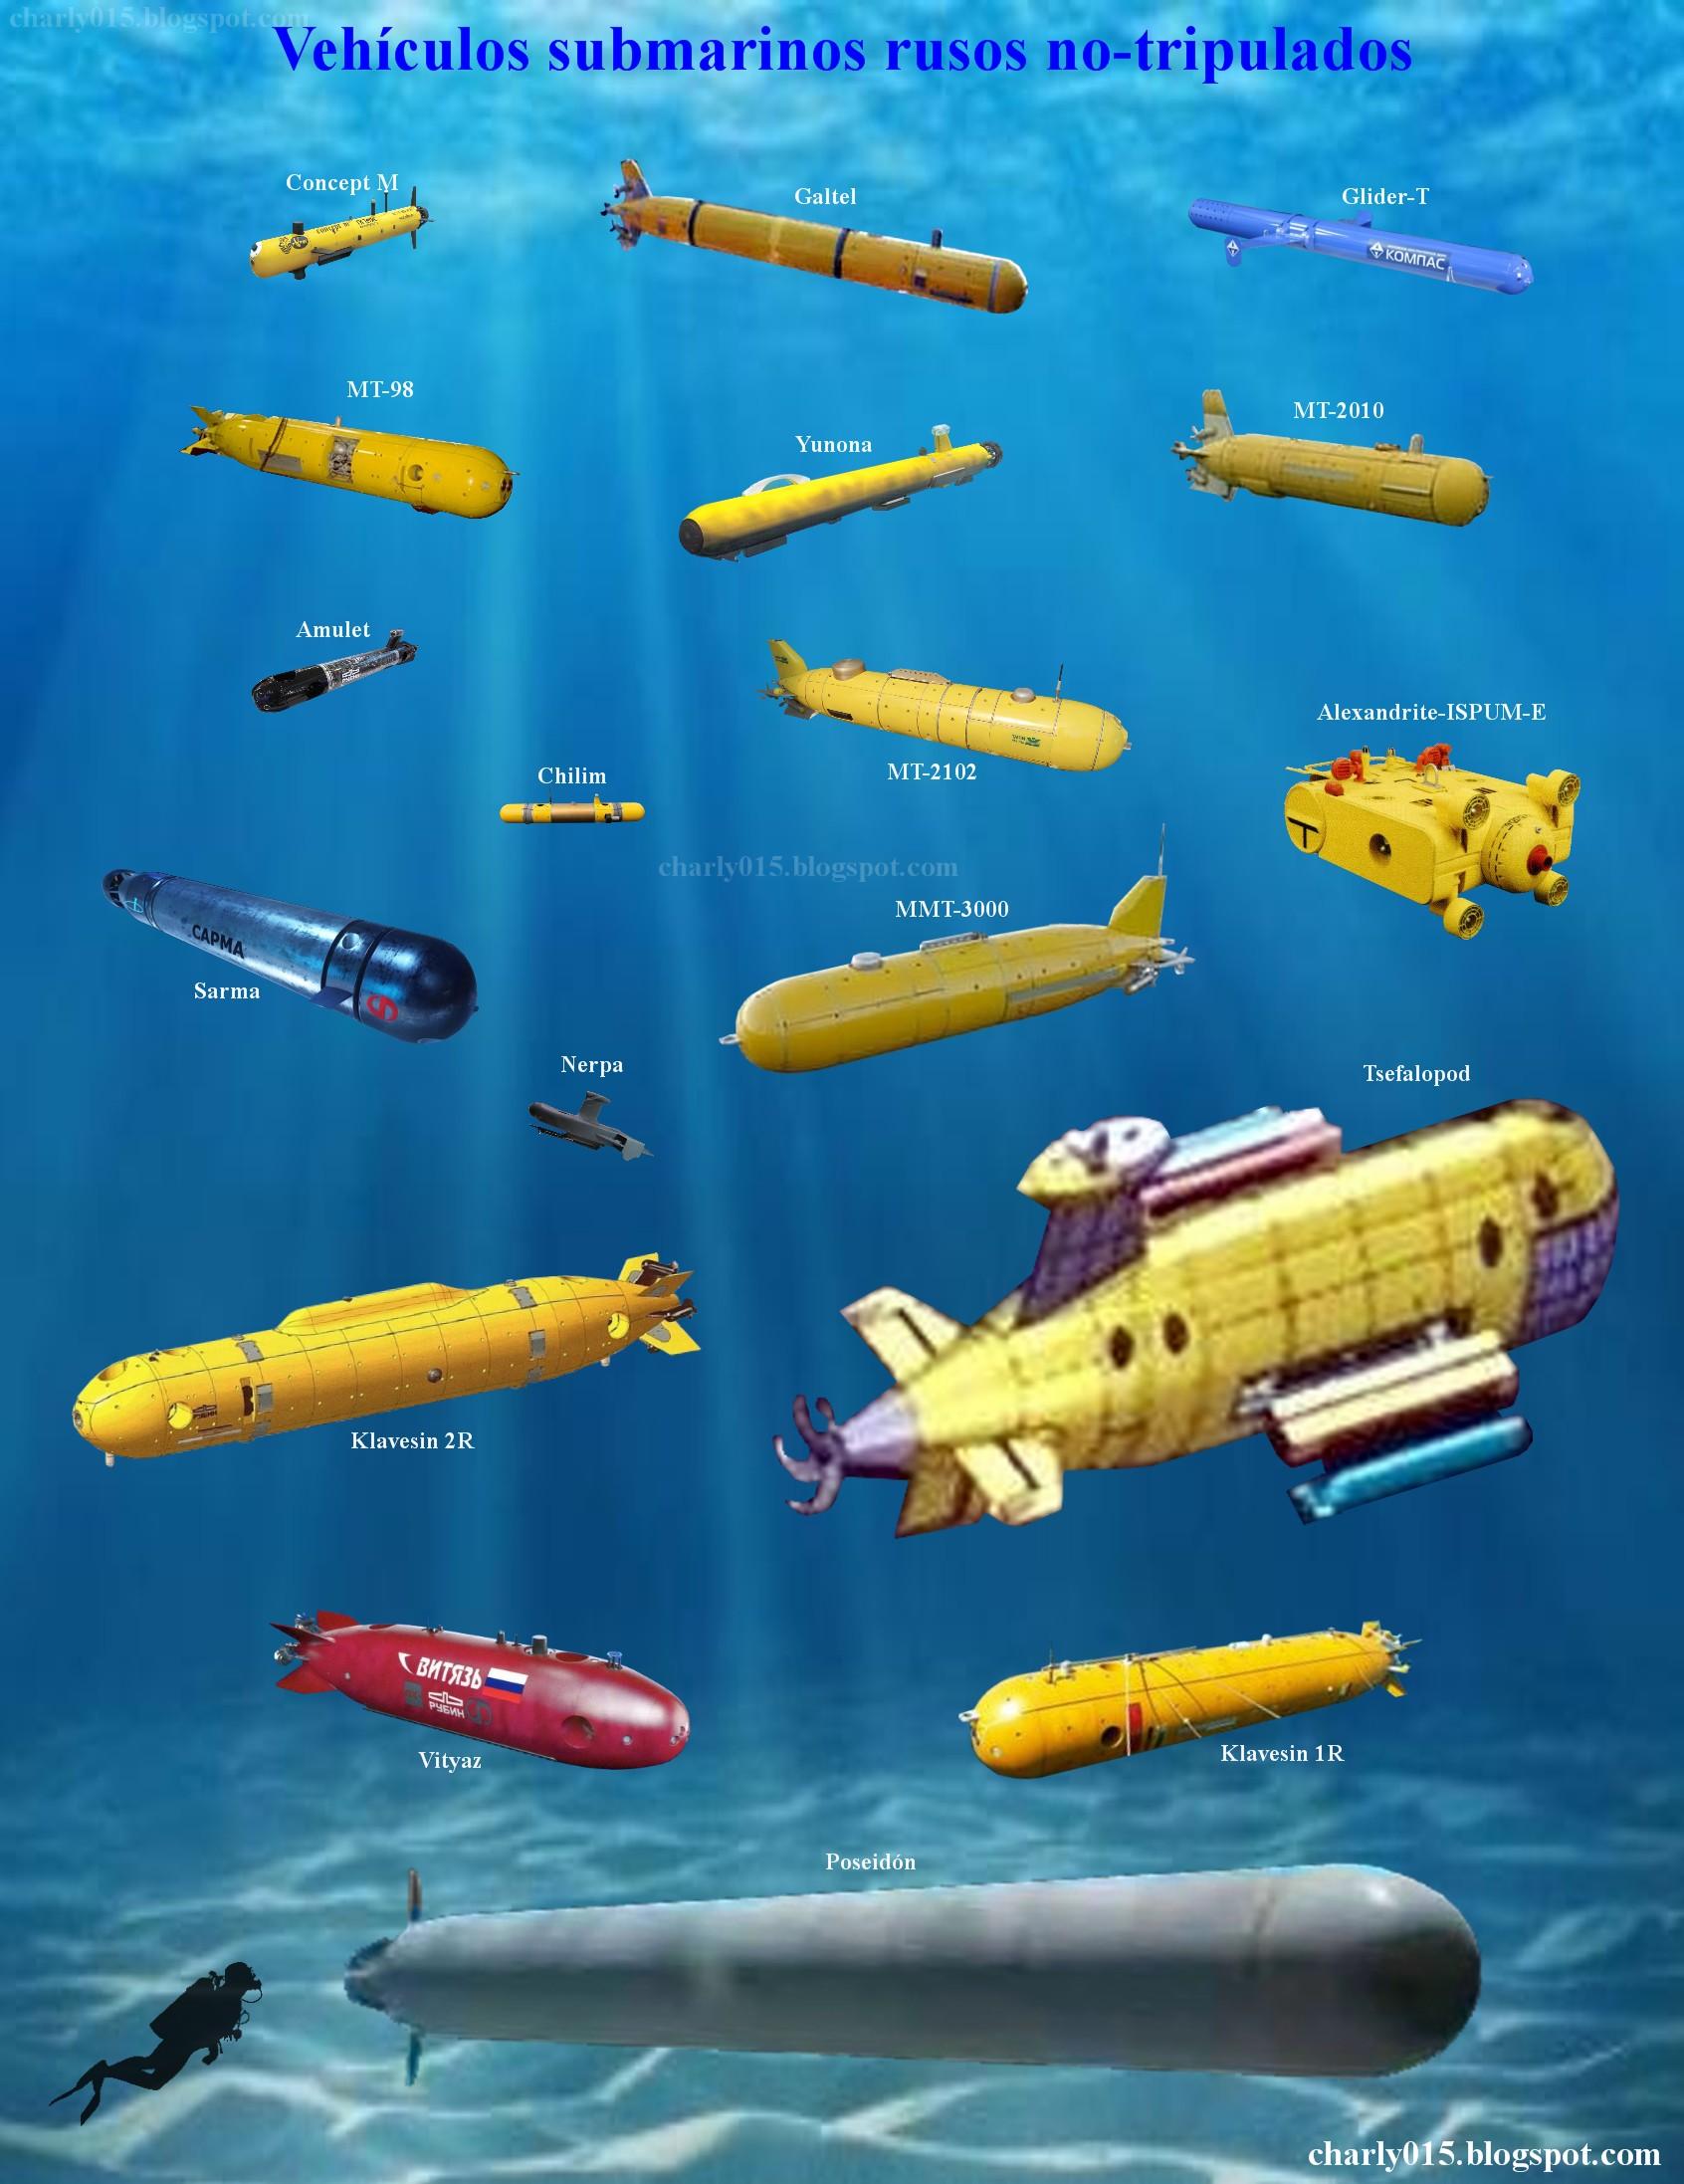 Underwater Drones of the Russian Navy - Page 4 EXmPlUSWAAASR_c?format=jpg&name=4096x4096